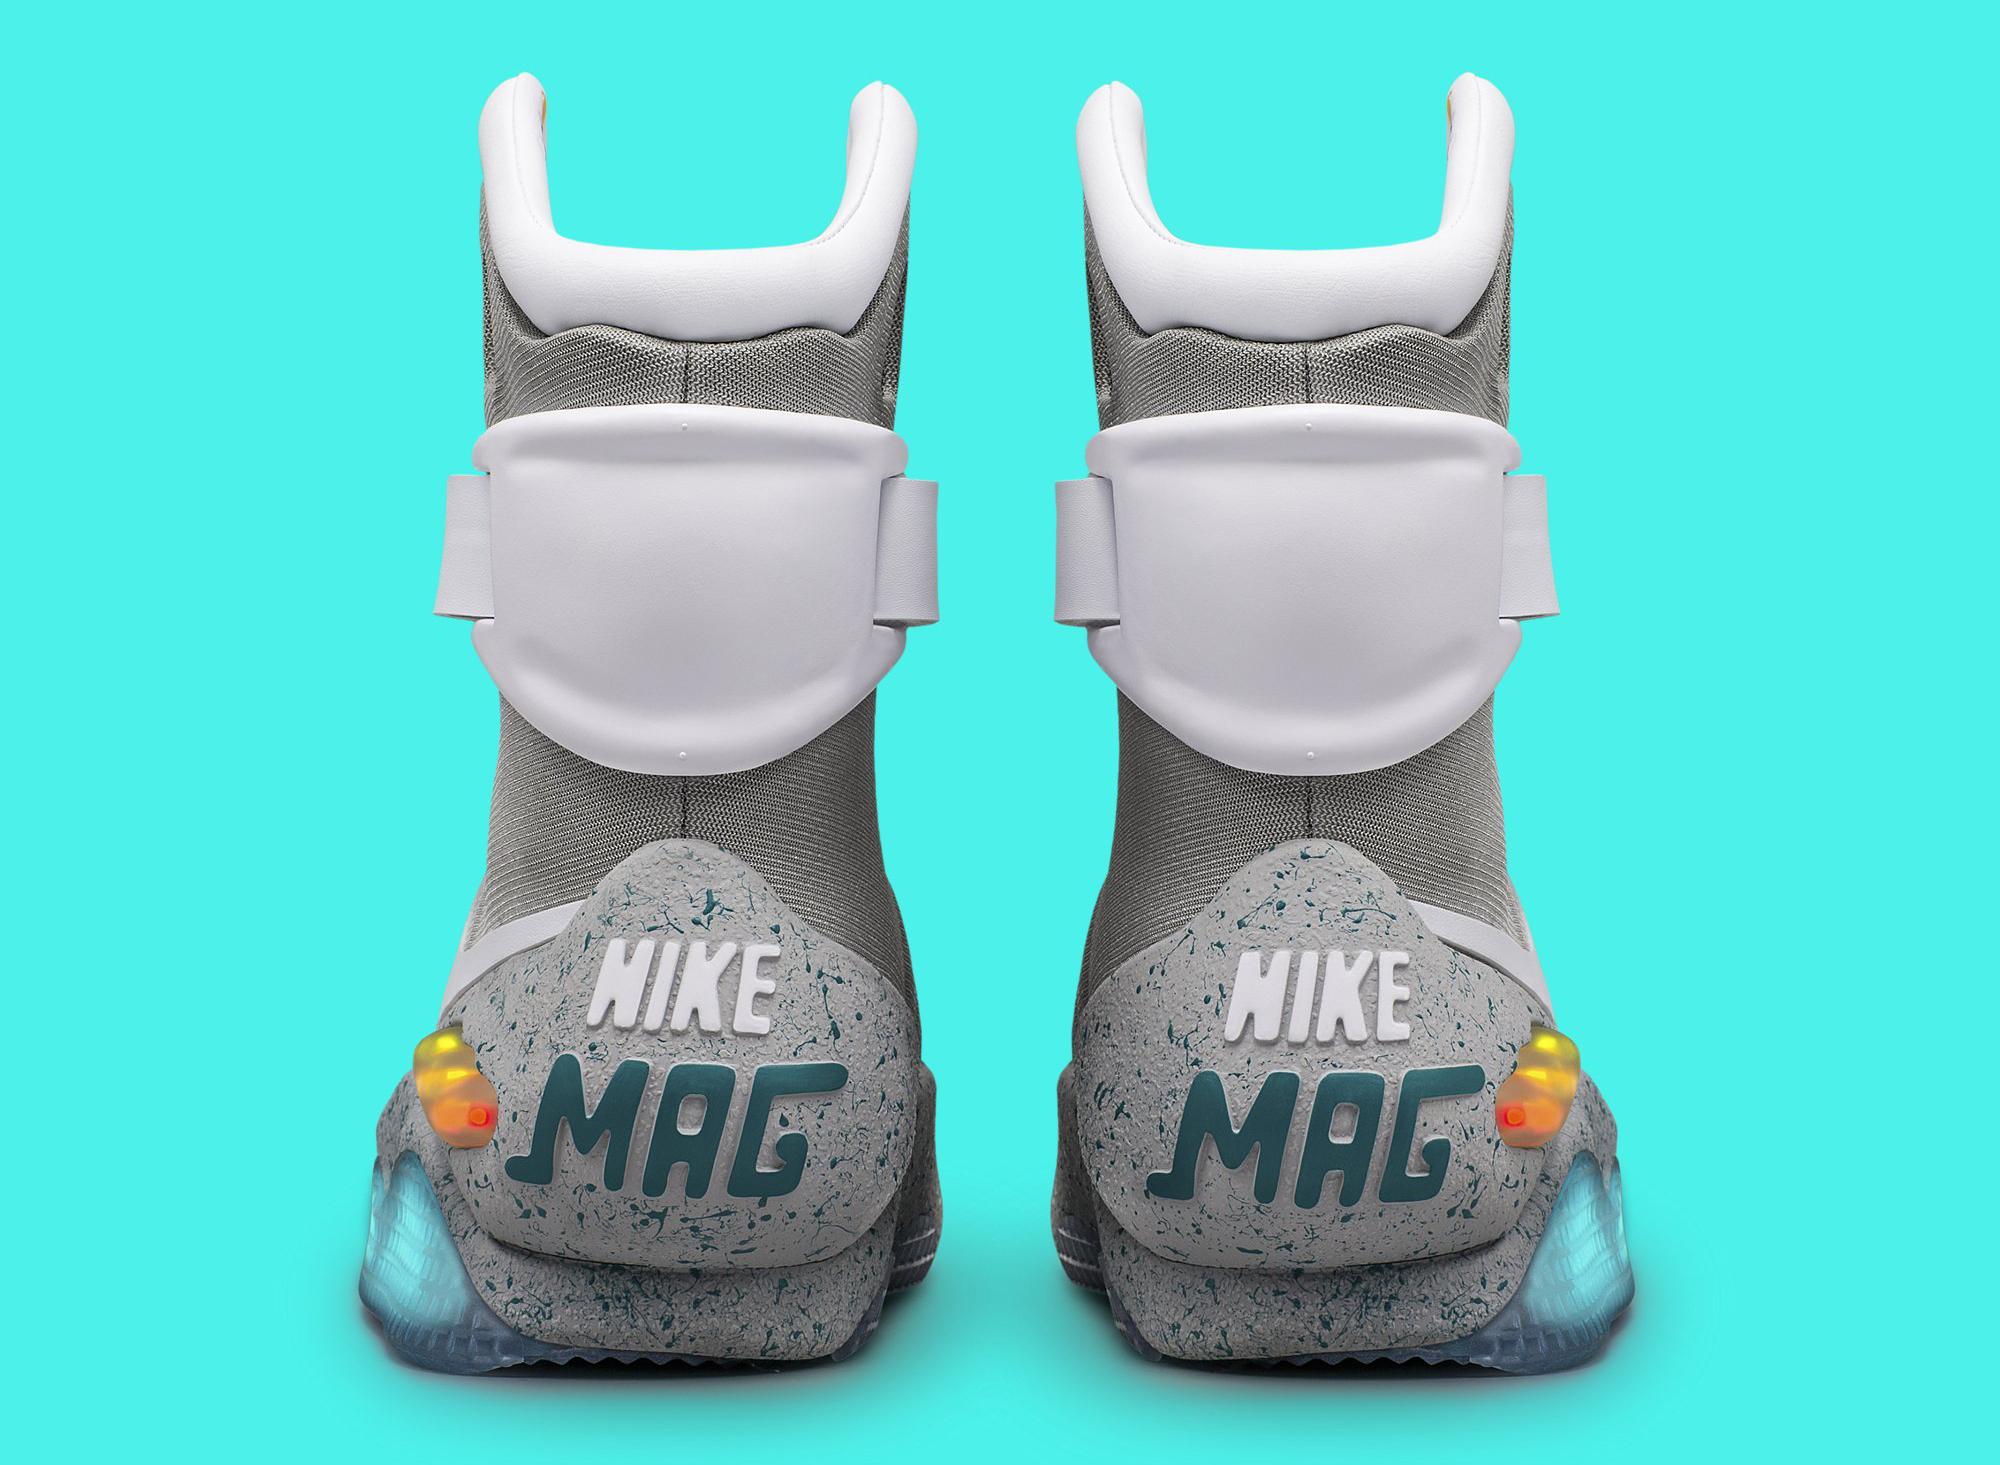 Nike Mag 2016 Heel